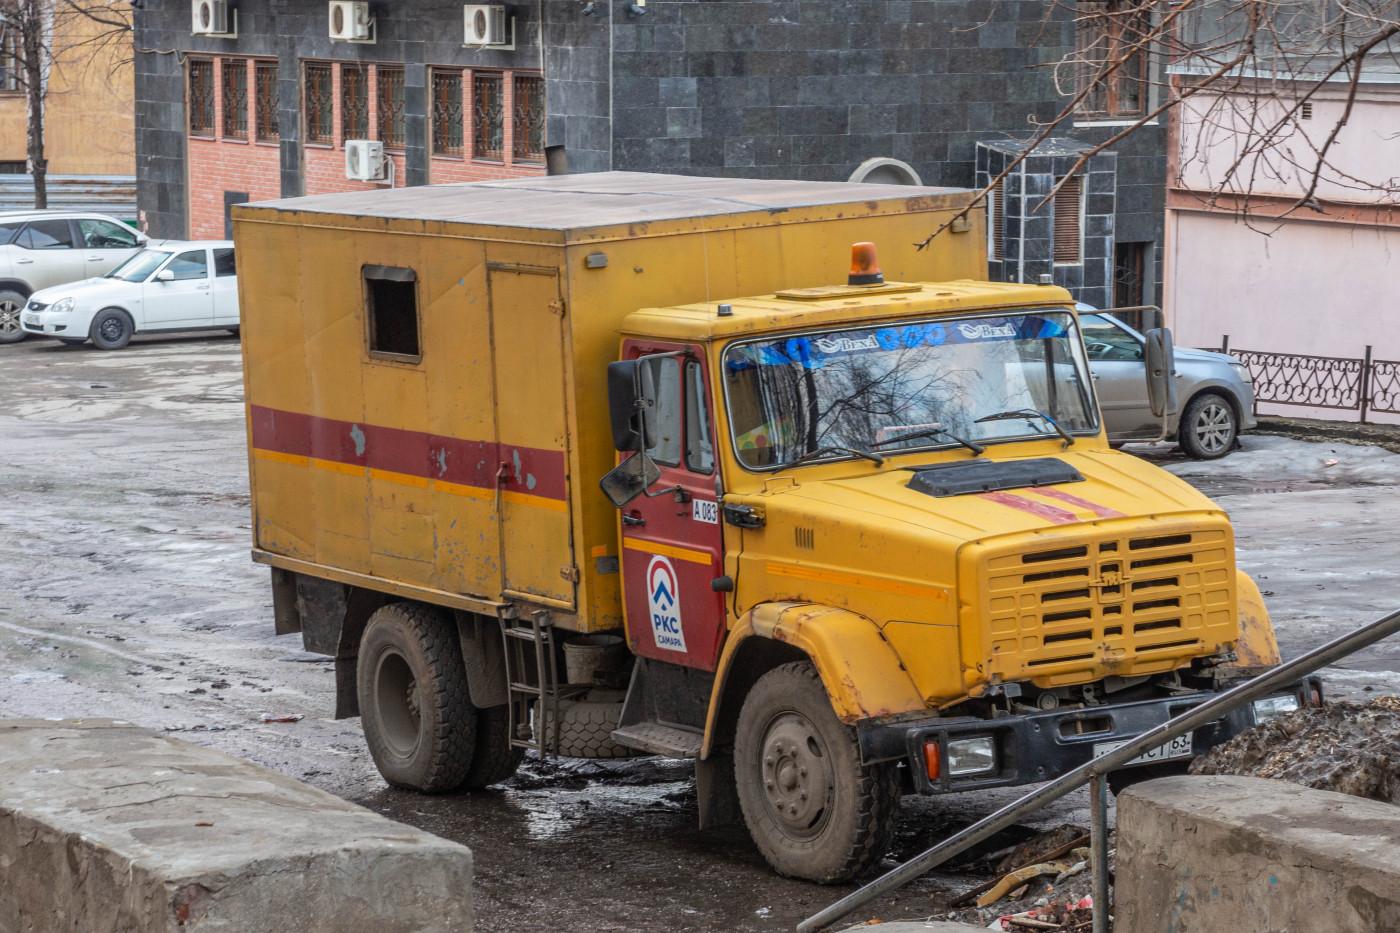 передвижная ремонтная мастерская на шасси ЗиЛ-4331*. г. Самара, ул. Ново-Садовая